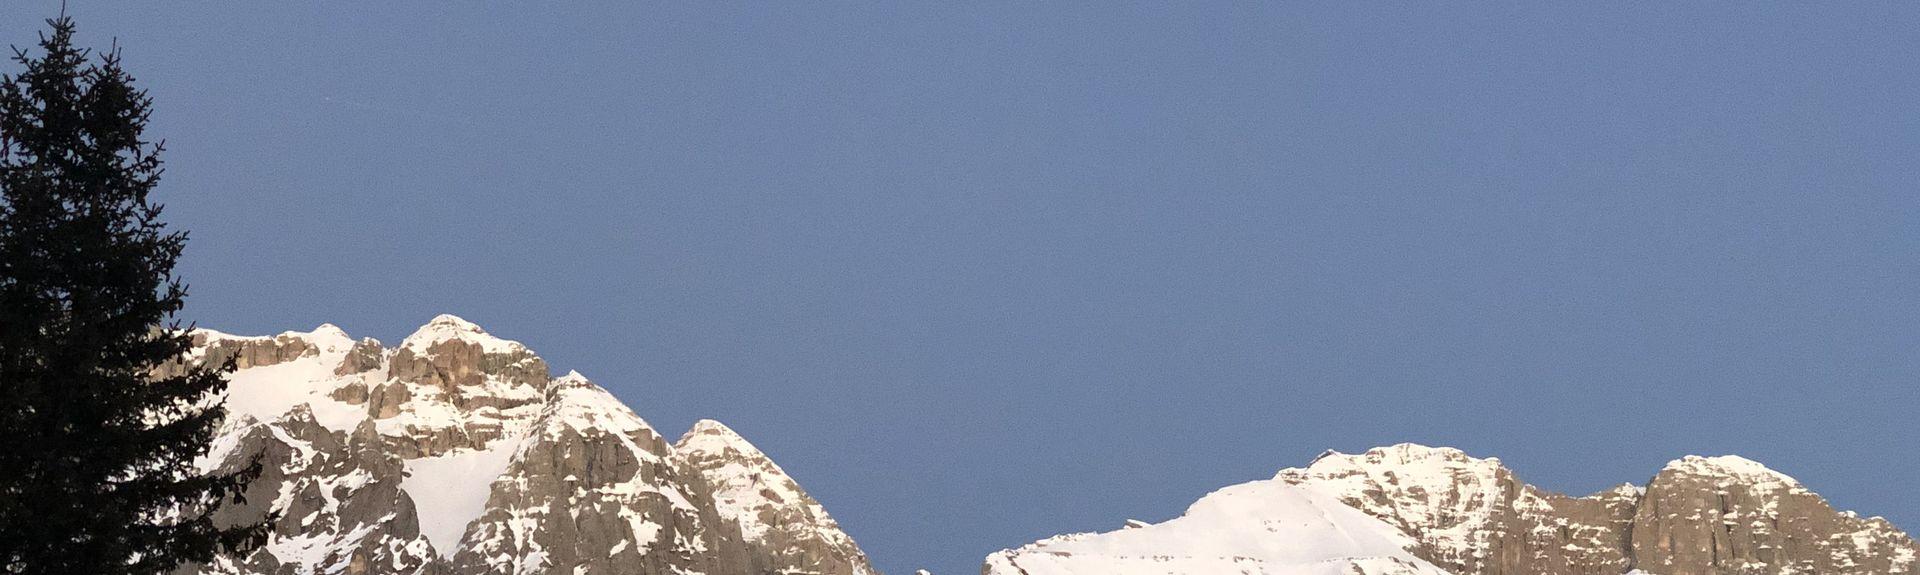 Celledizzo, Trento, Trentino-Alto Adige/South Tyrol, Italy